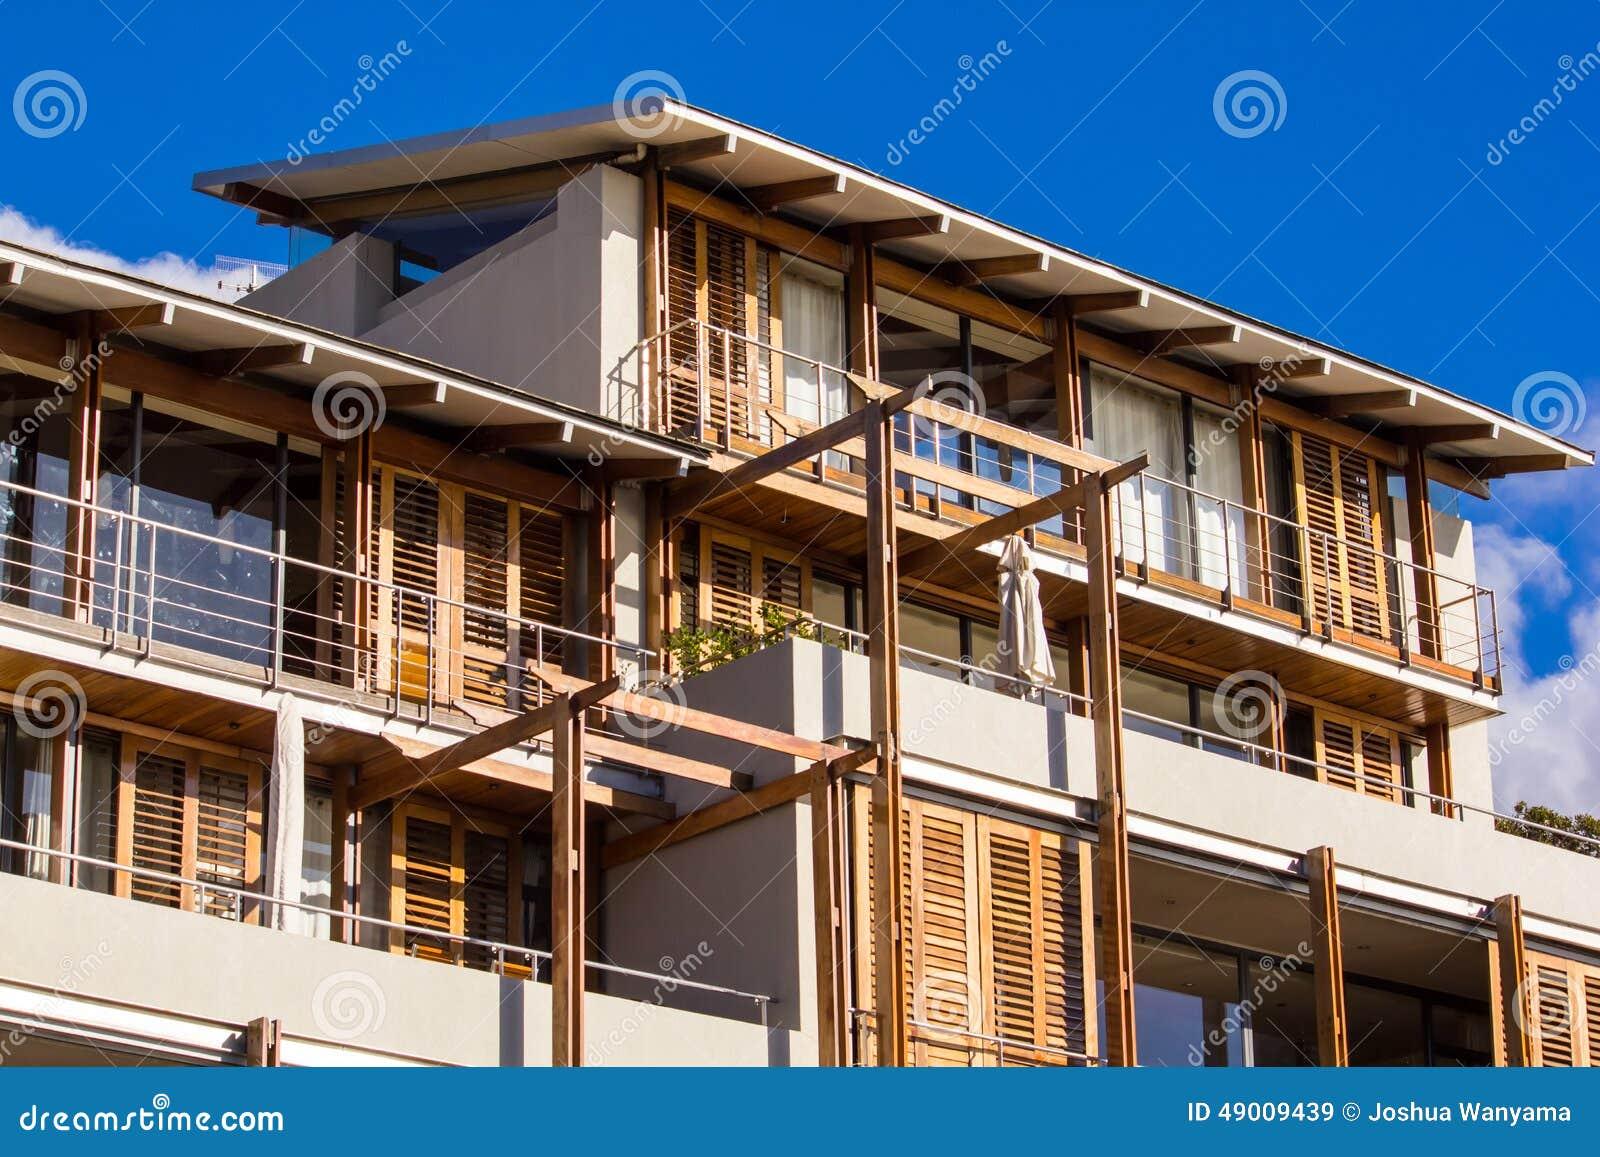 Nice Apartment Building nice apartment building with balcony stock photo - image: 40803826